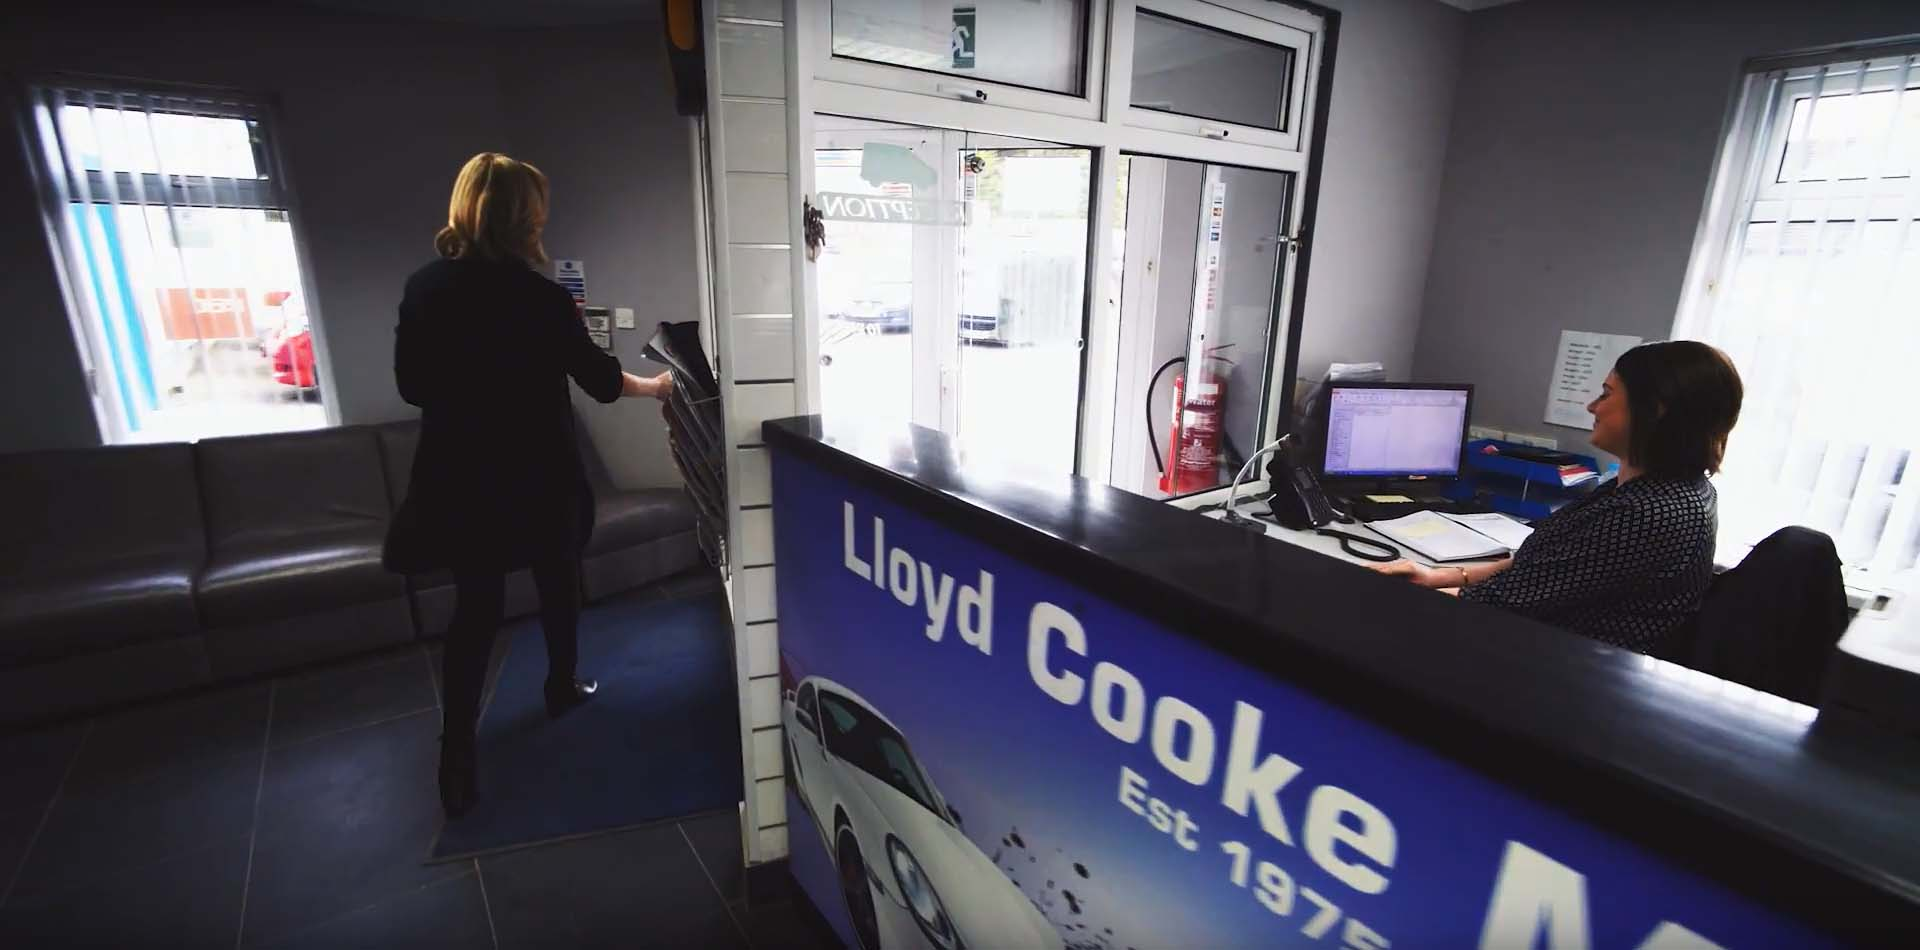 Car repairs in Derry/Londonderry